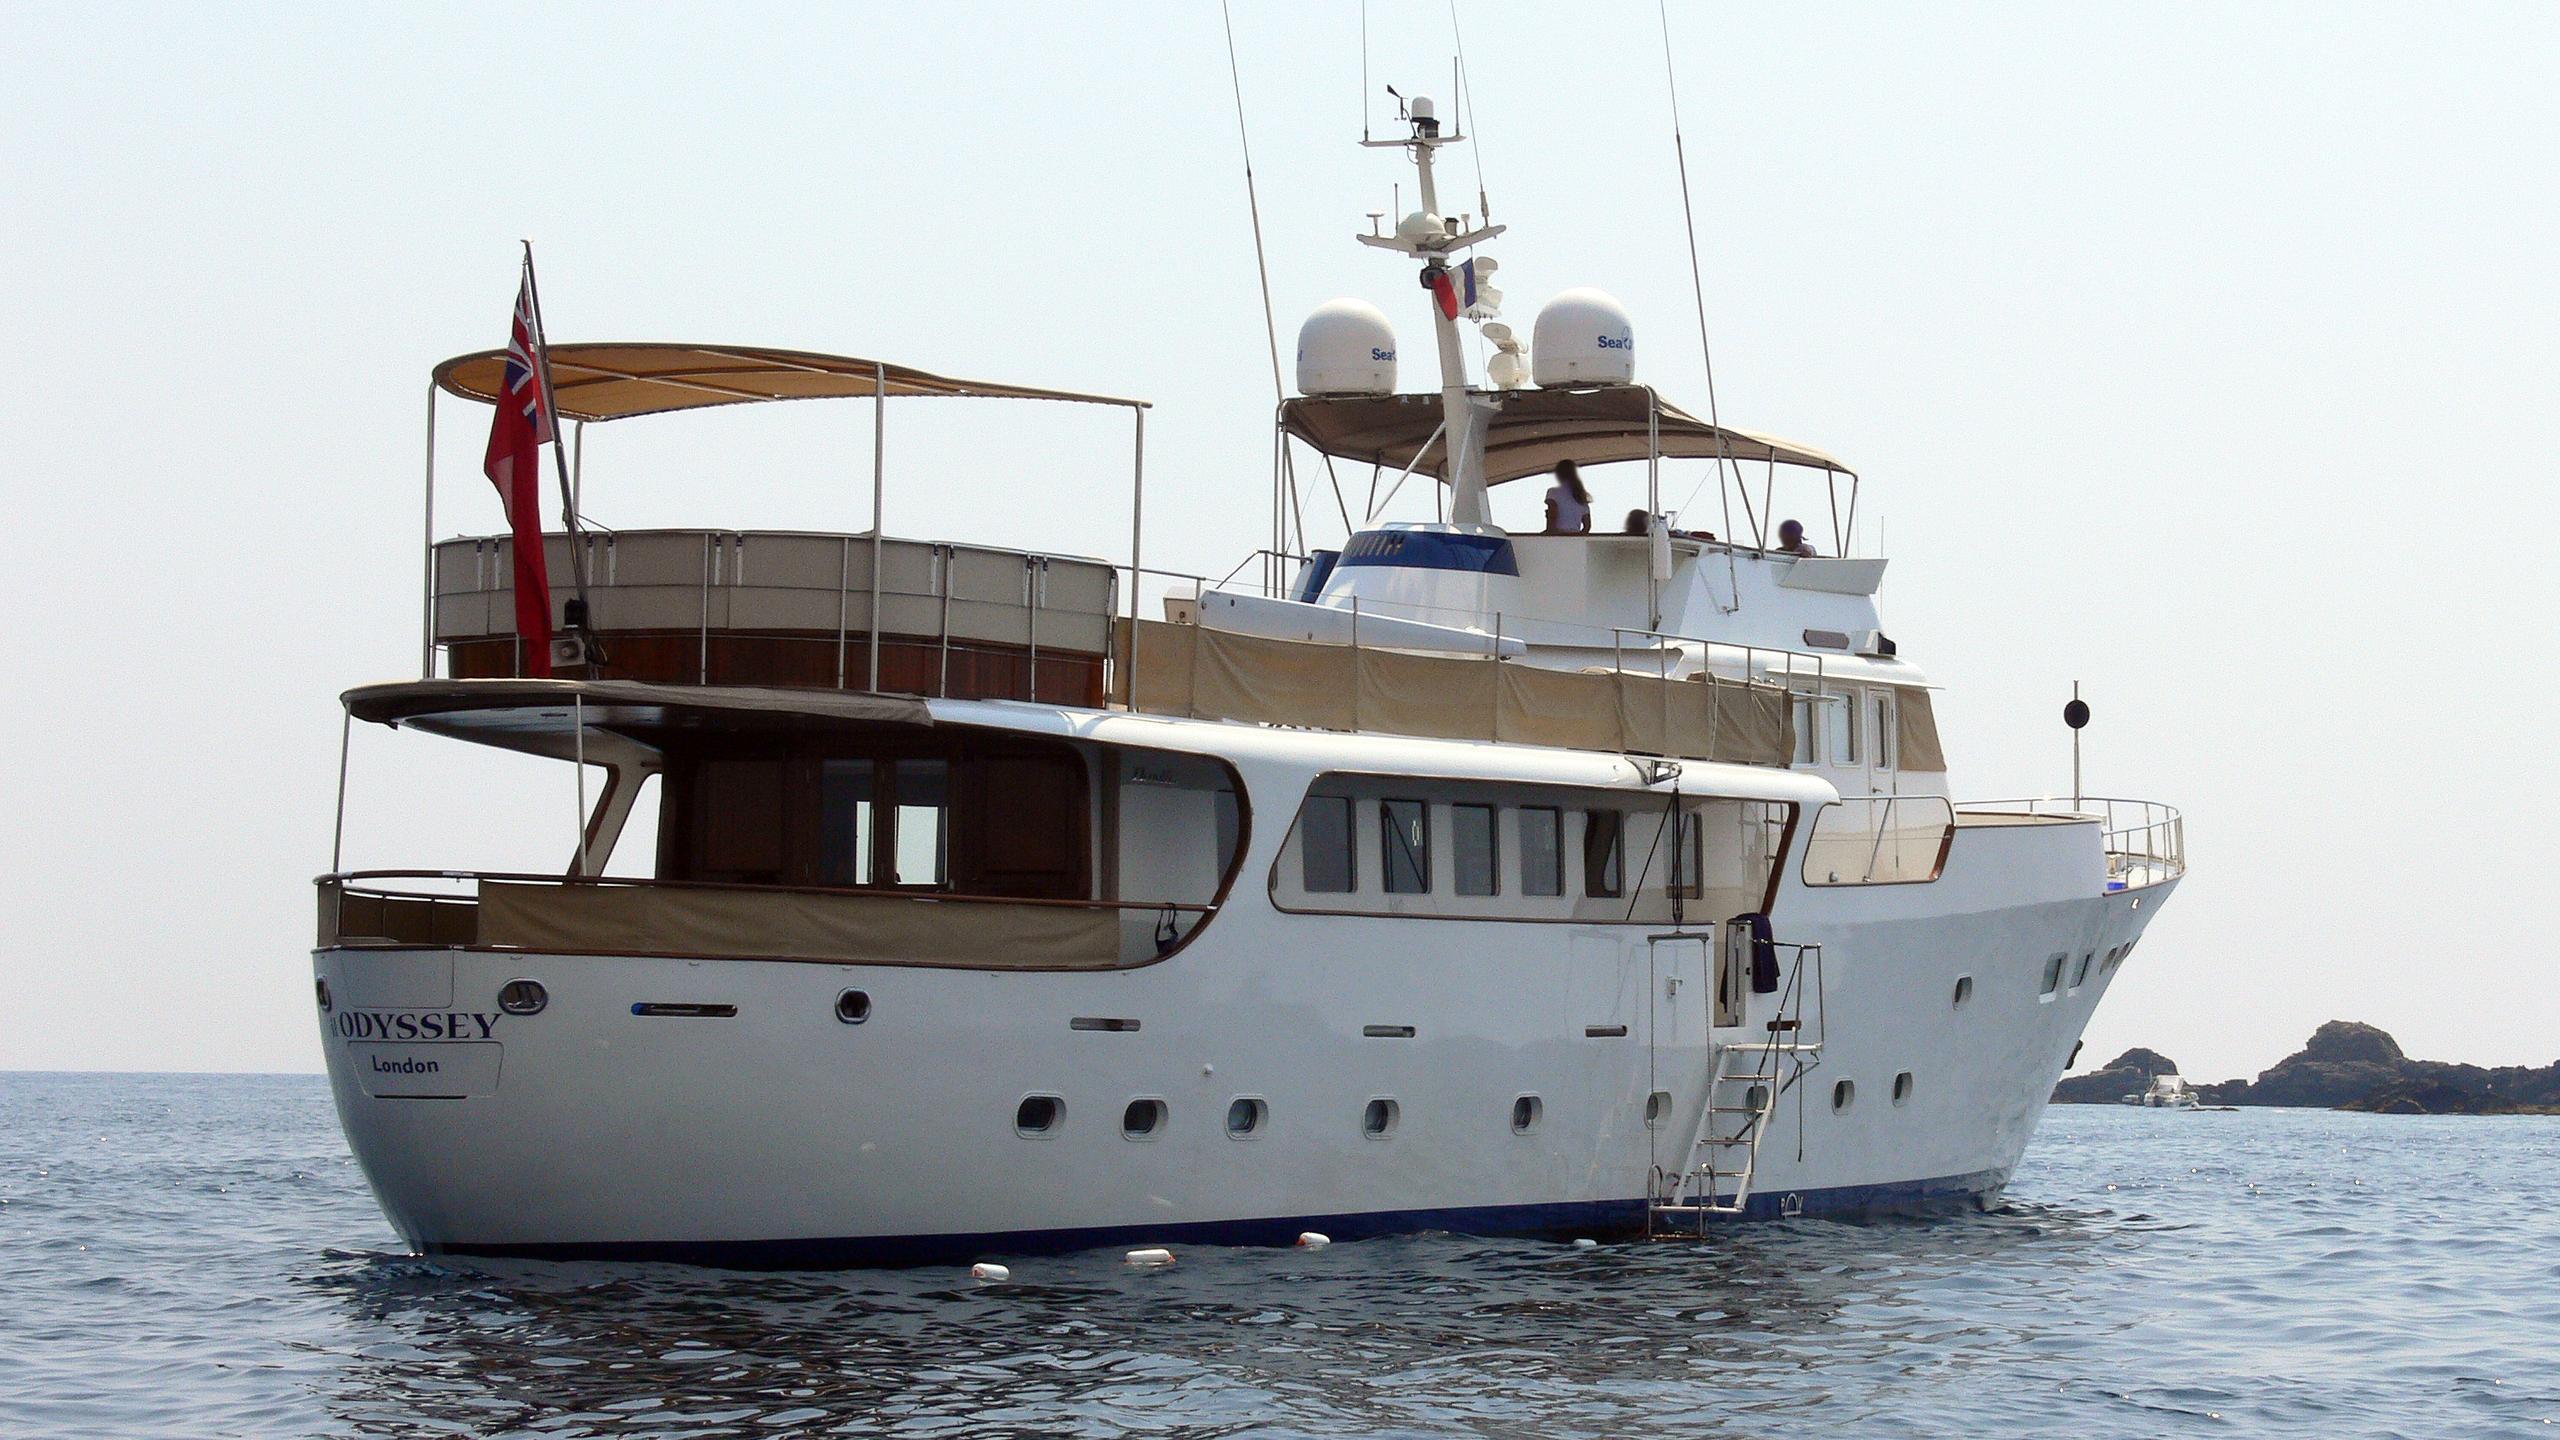 il-odyssey-motor-yacht-benetti-mediterraneo-1967-33m-stern